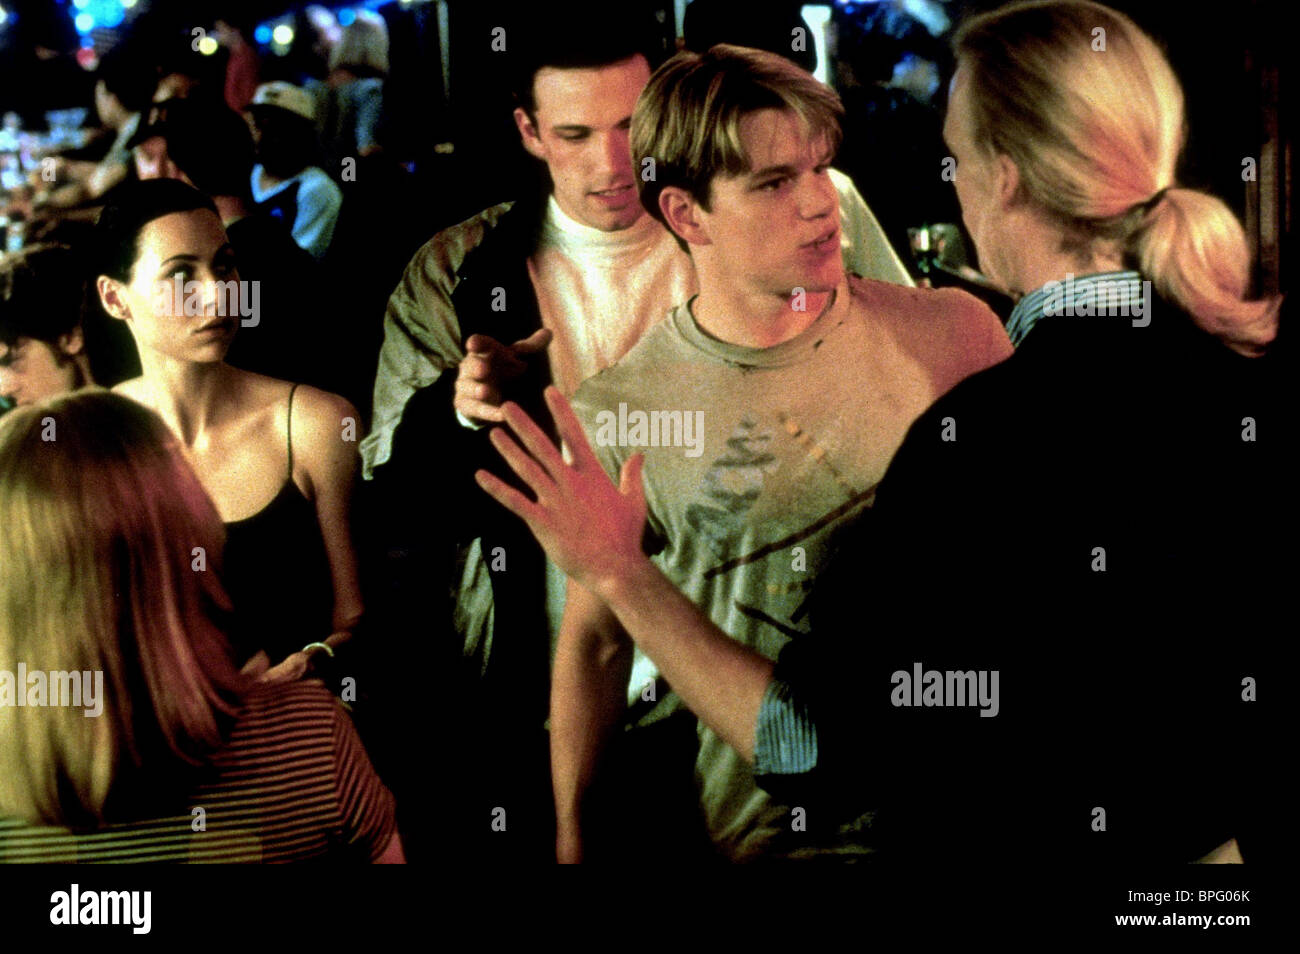 Minnie Driver Ben Affleck Matt Damon Good Will Hunting 1997 Stock Photo Alamy